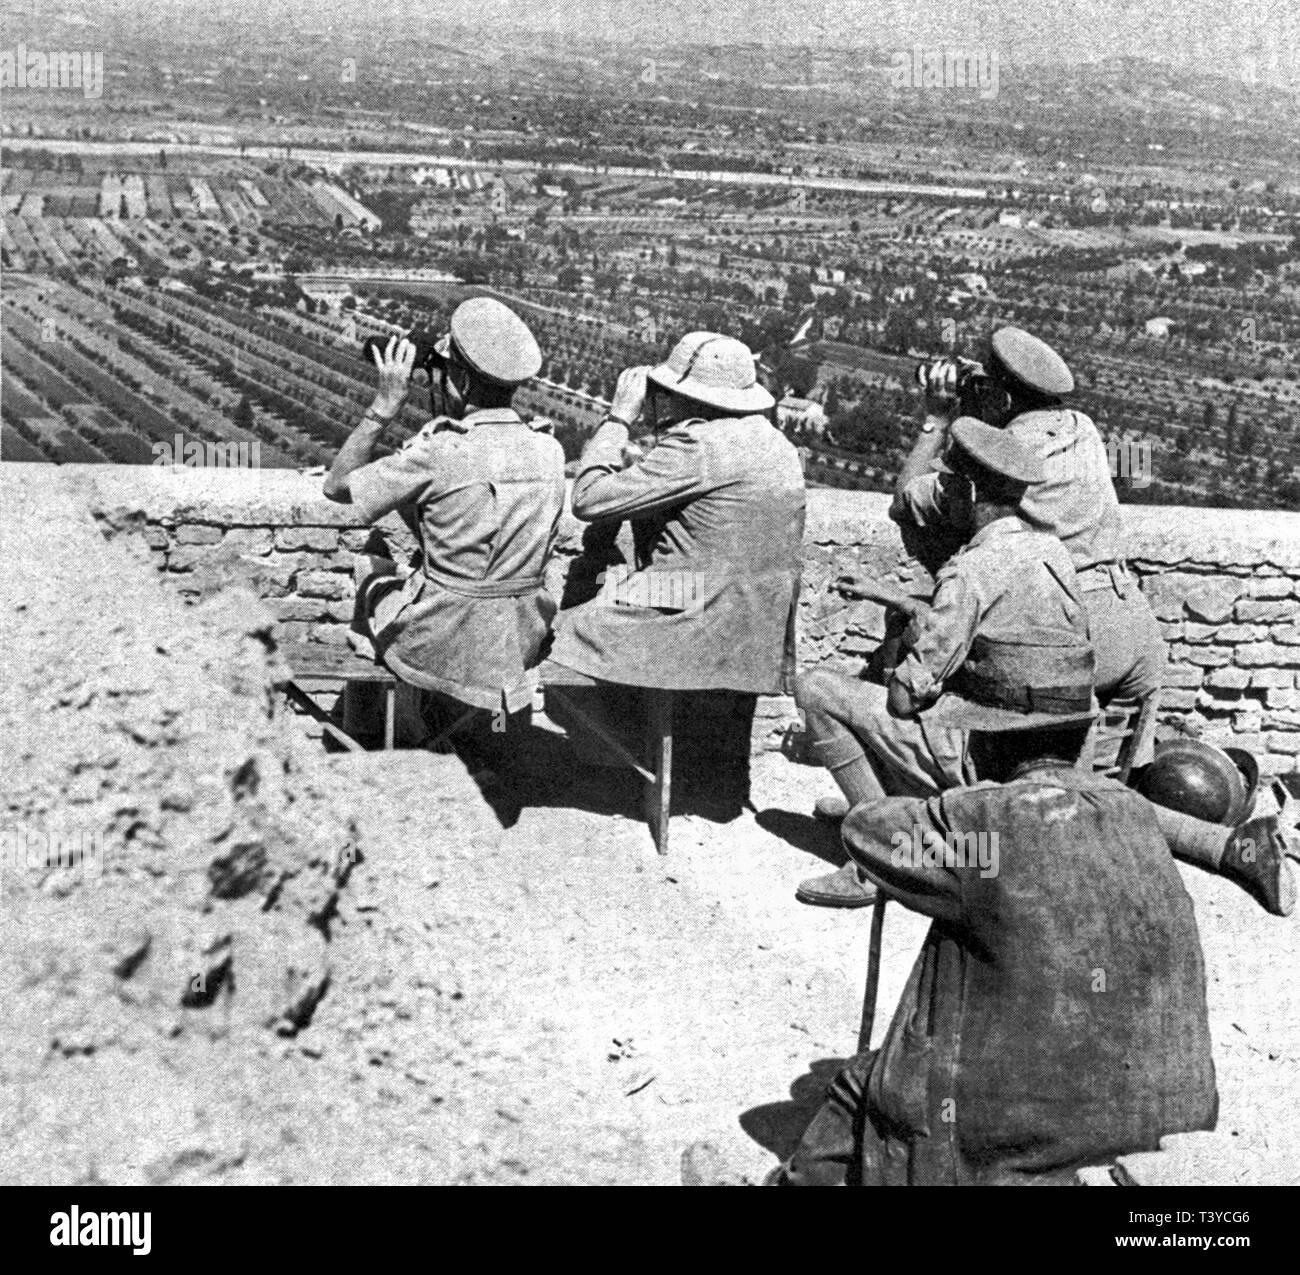 Winston Churchill at the front of the Italian campaign near Monte Maggiore. August 1944 - Stock Image